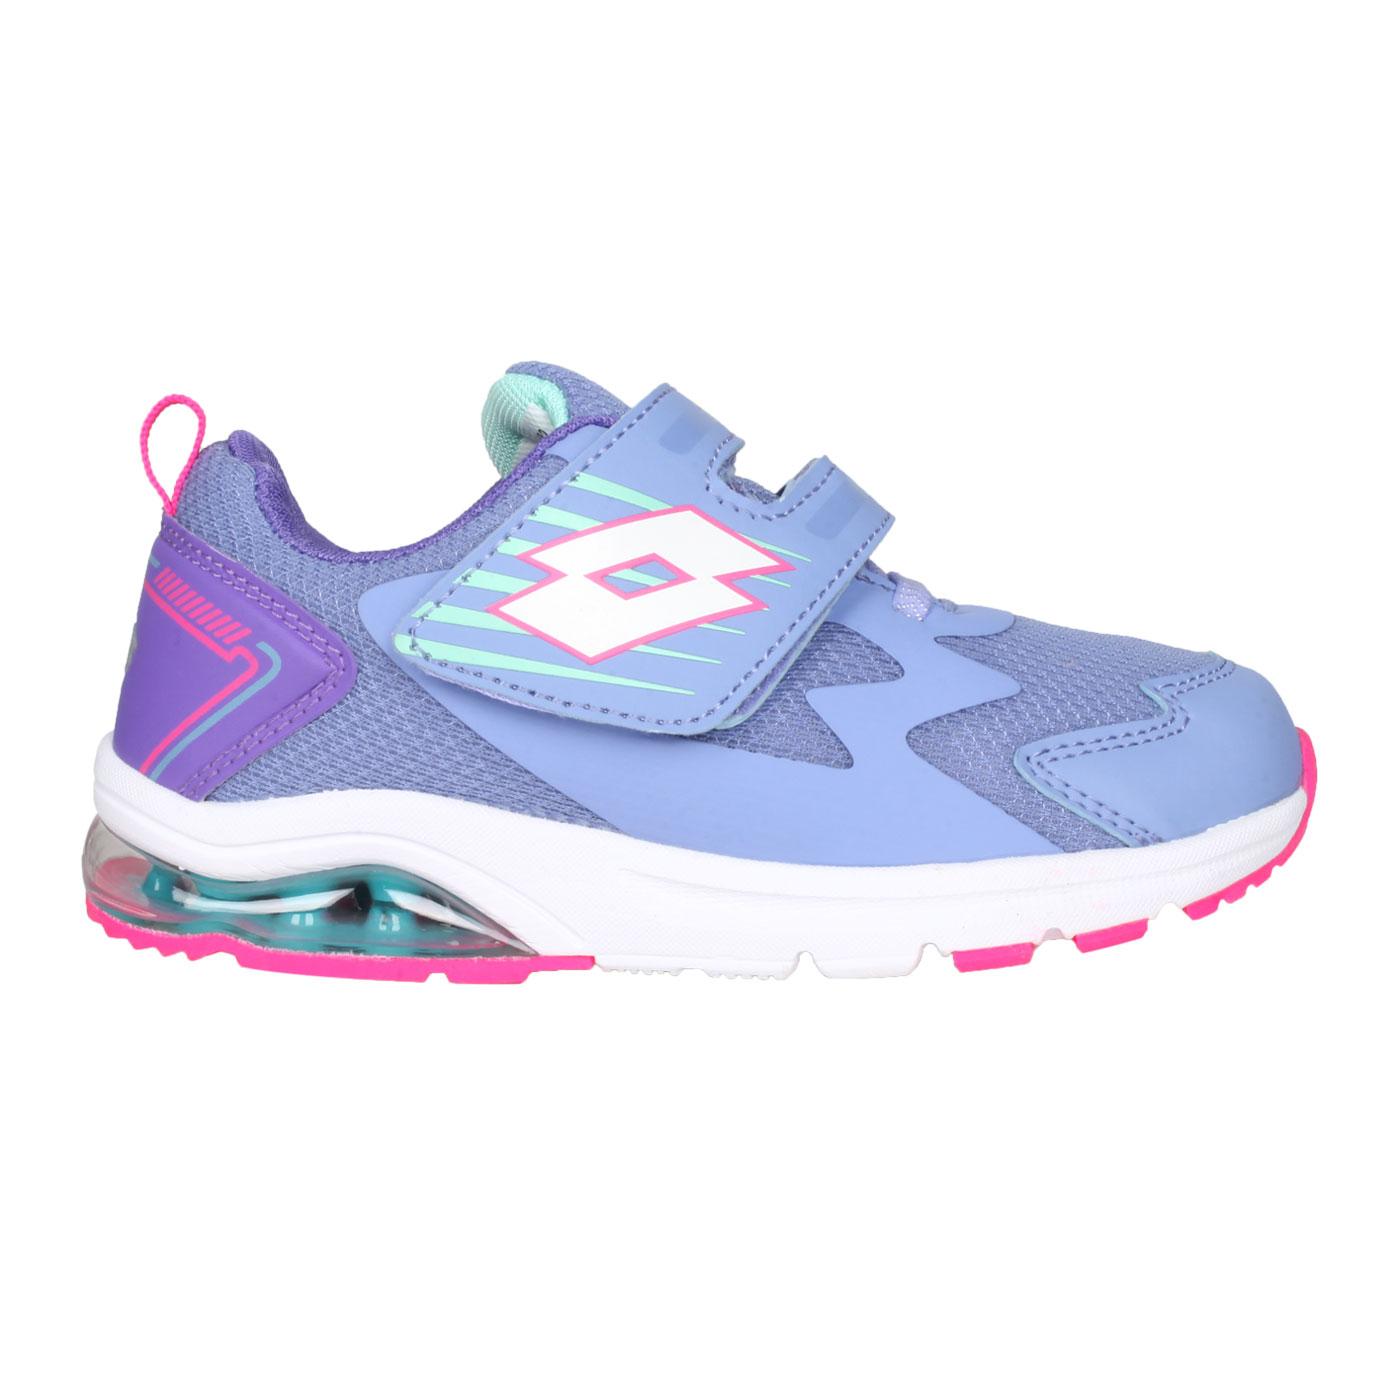 LOTTO 大童避震氣墊跑鞋 LT1AKR3777 - 紫桃紅白